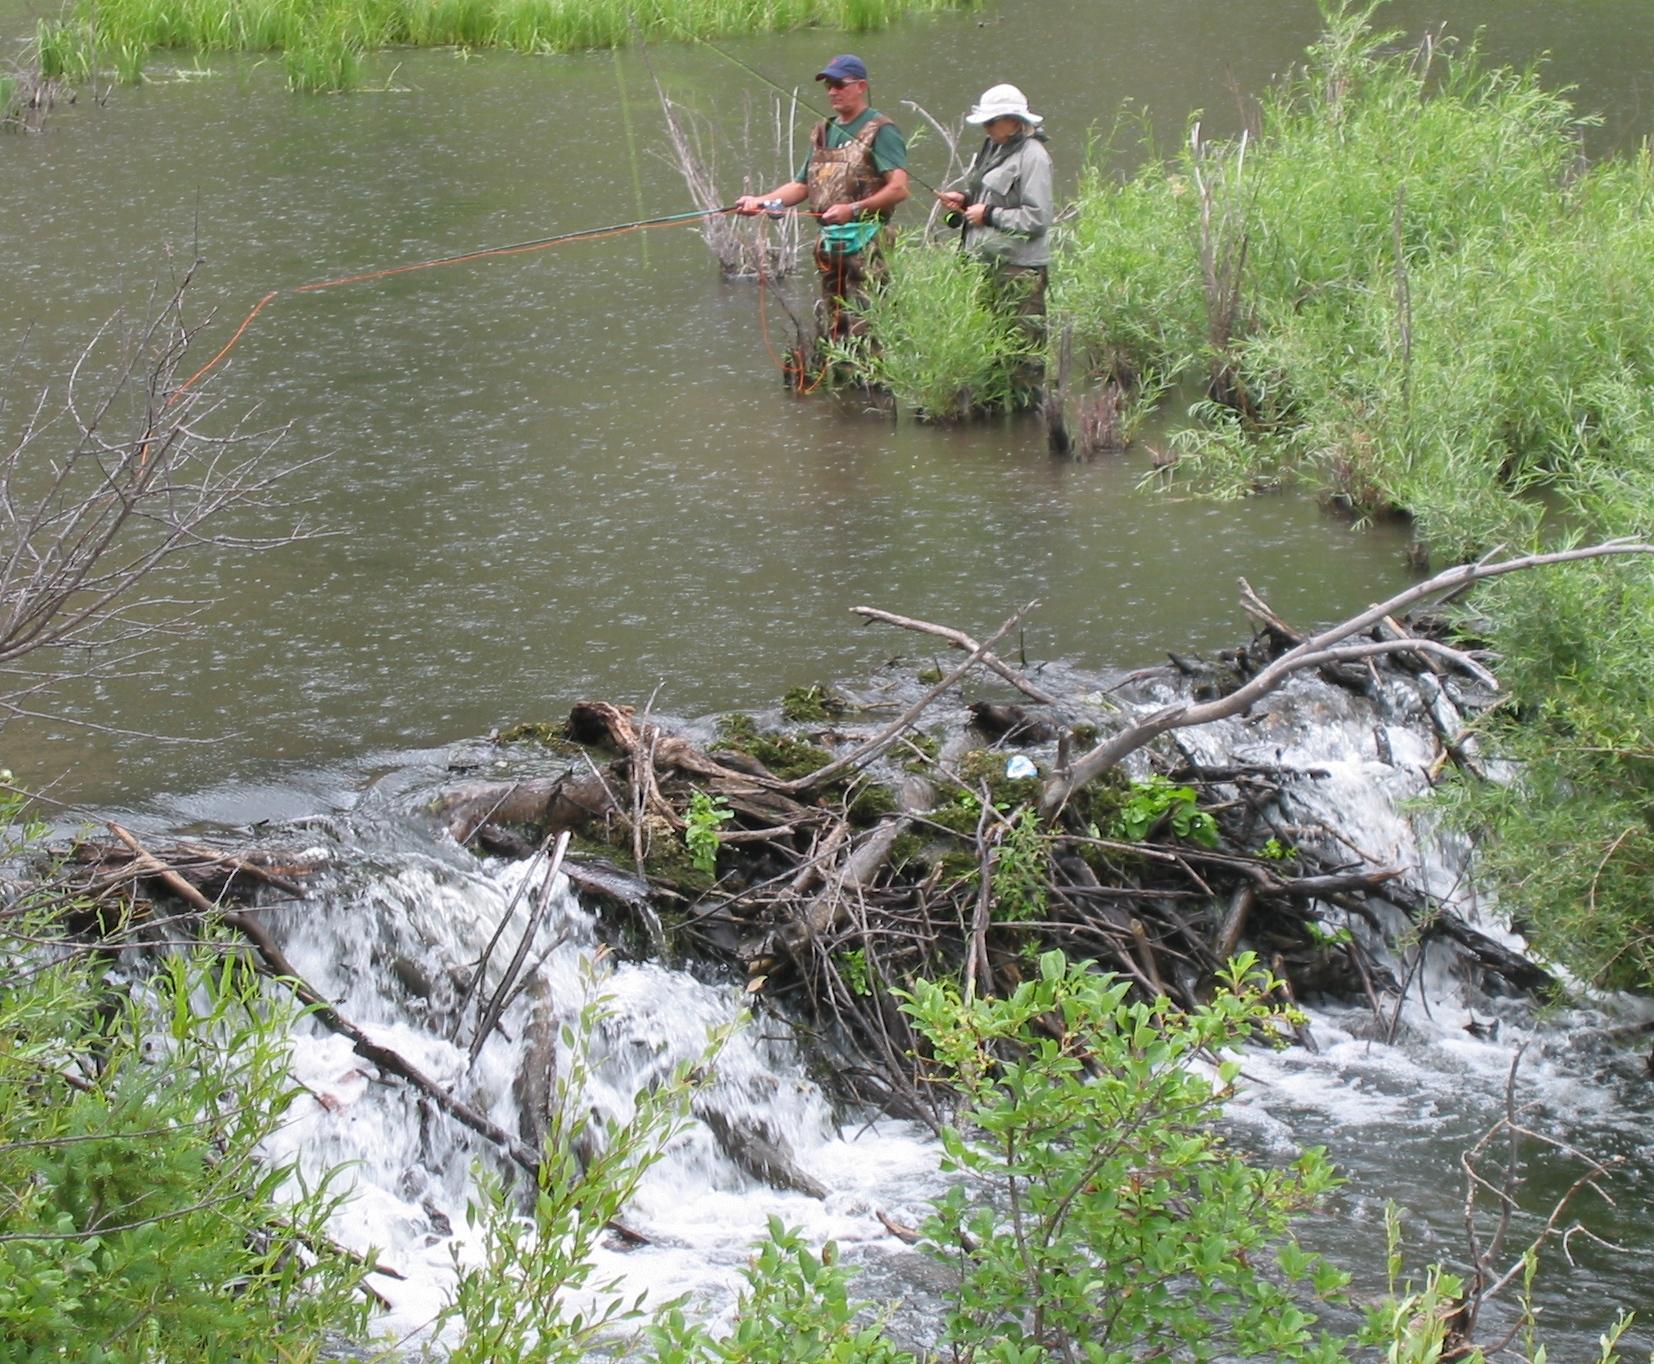 Fishermen in beaver pond, Cimarron Canyon NM